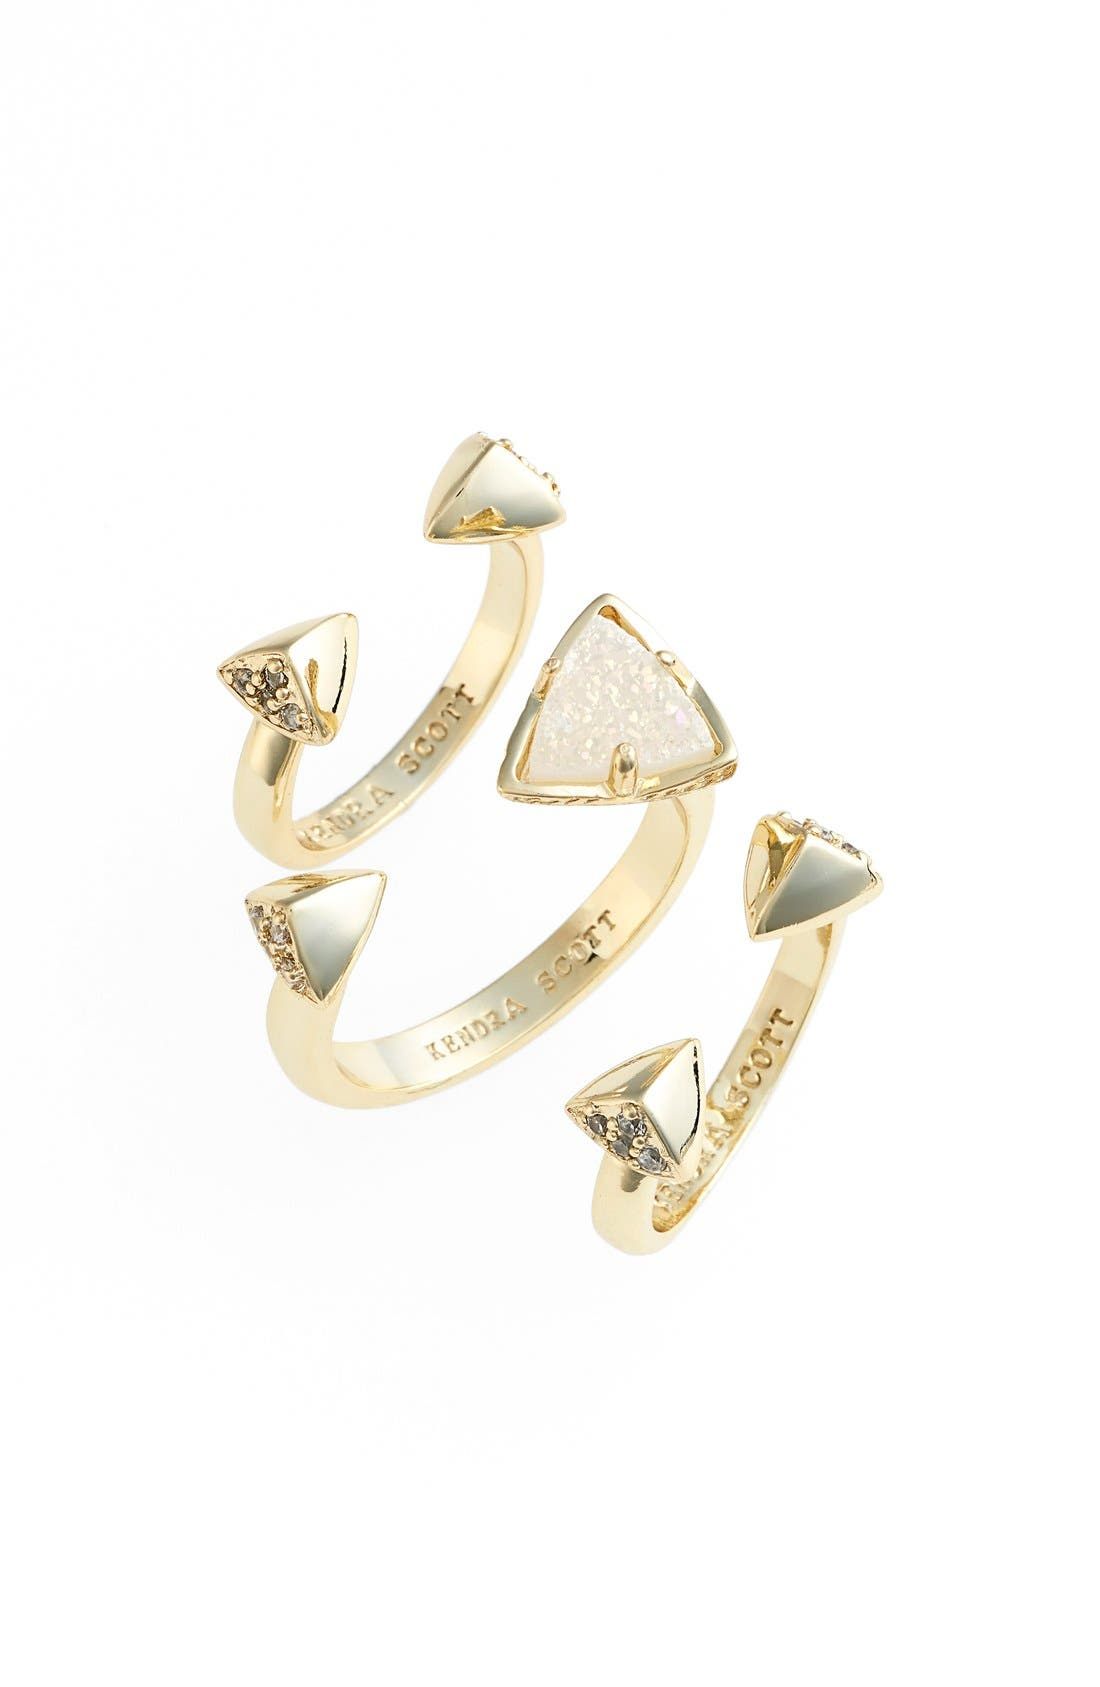 Alternate Image 1 Selected - Kendra Scott 'Brennan' Spiked Open Ring & Midi Rings (Set of 3)